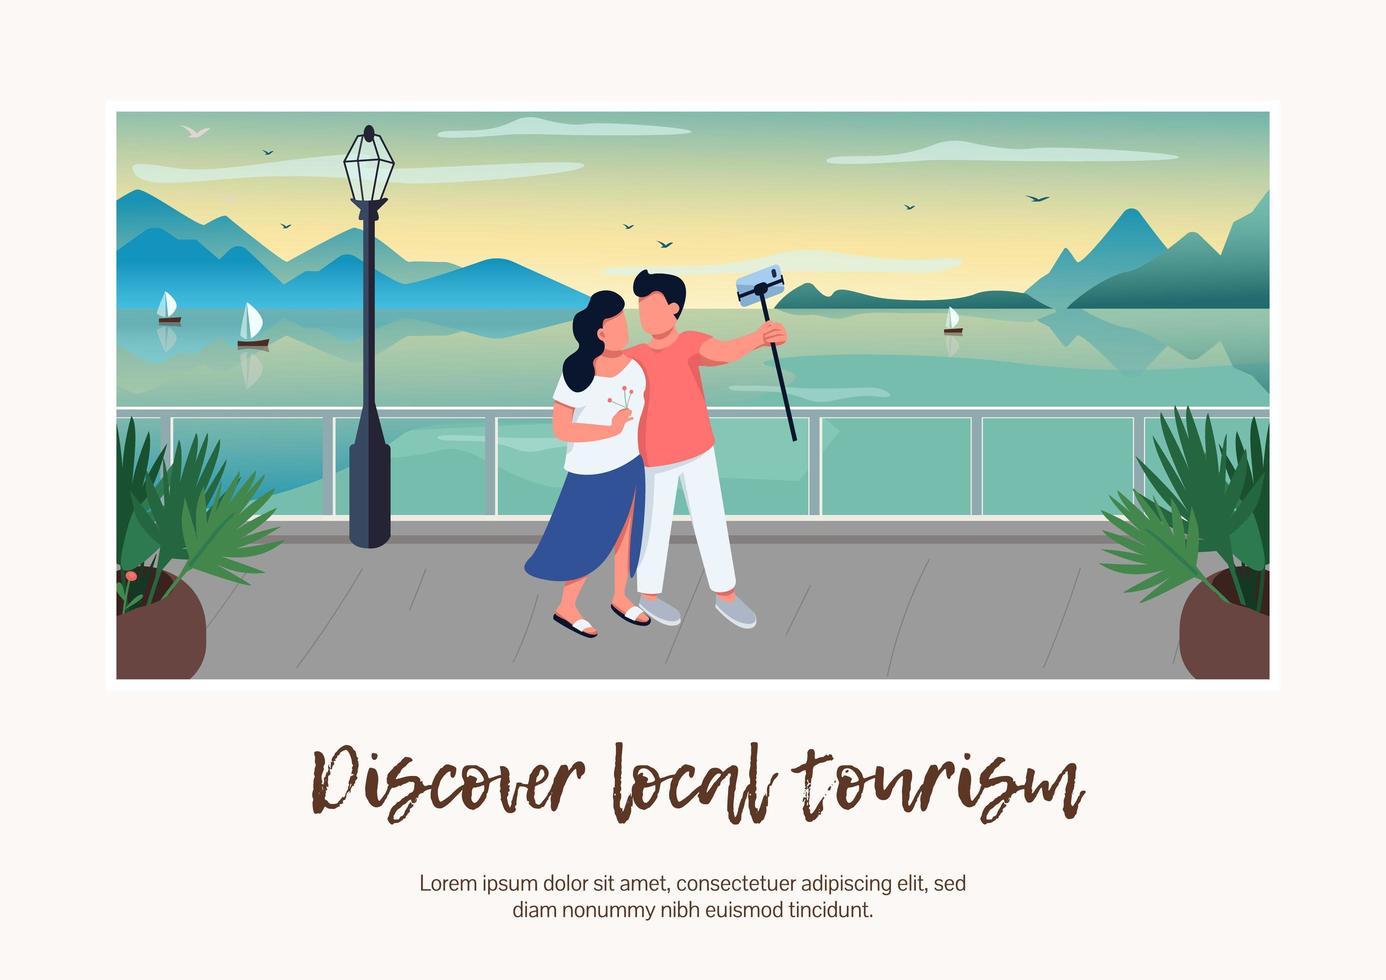 descubrir banner de turismo local vector